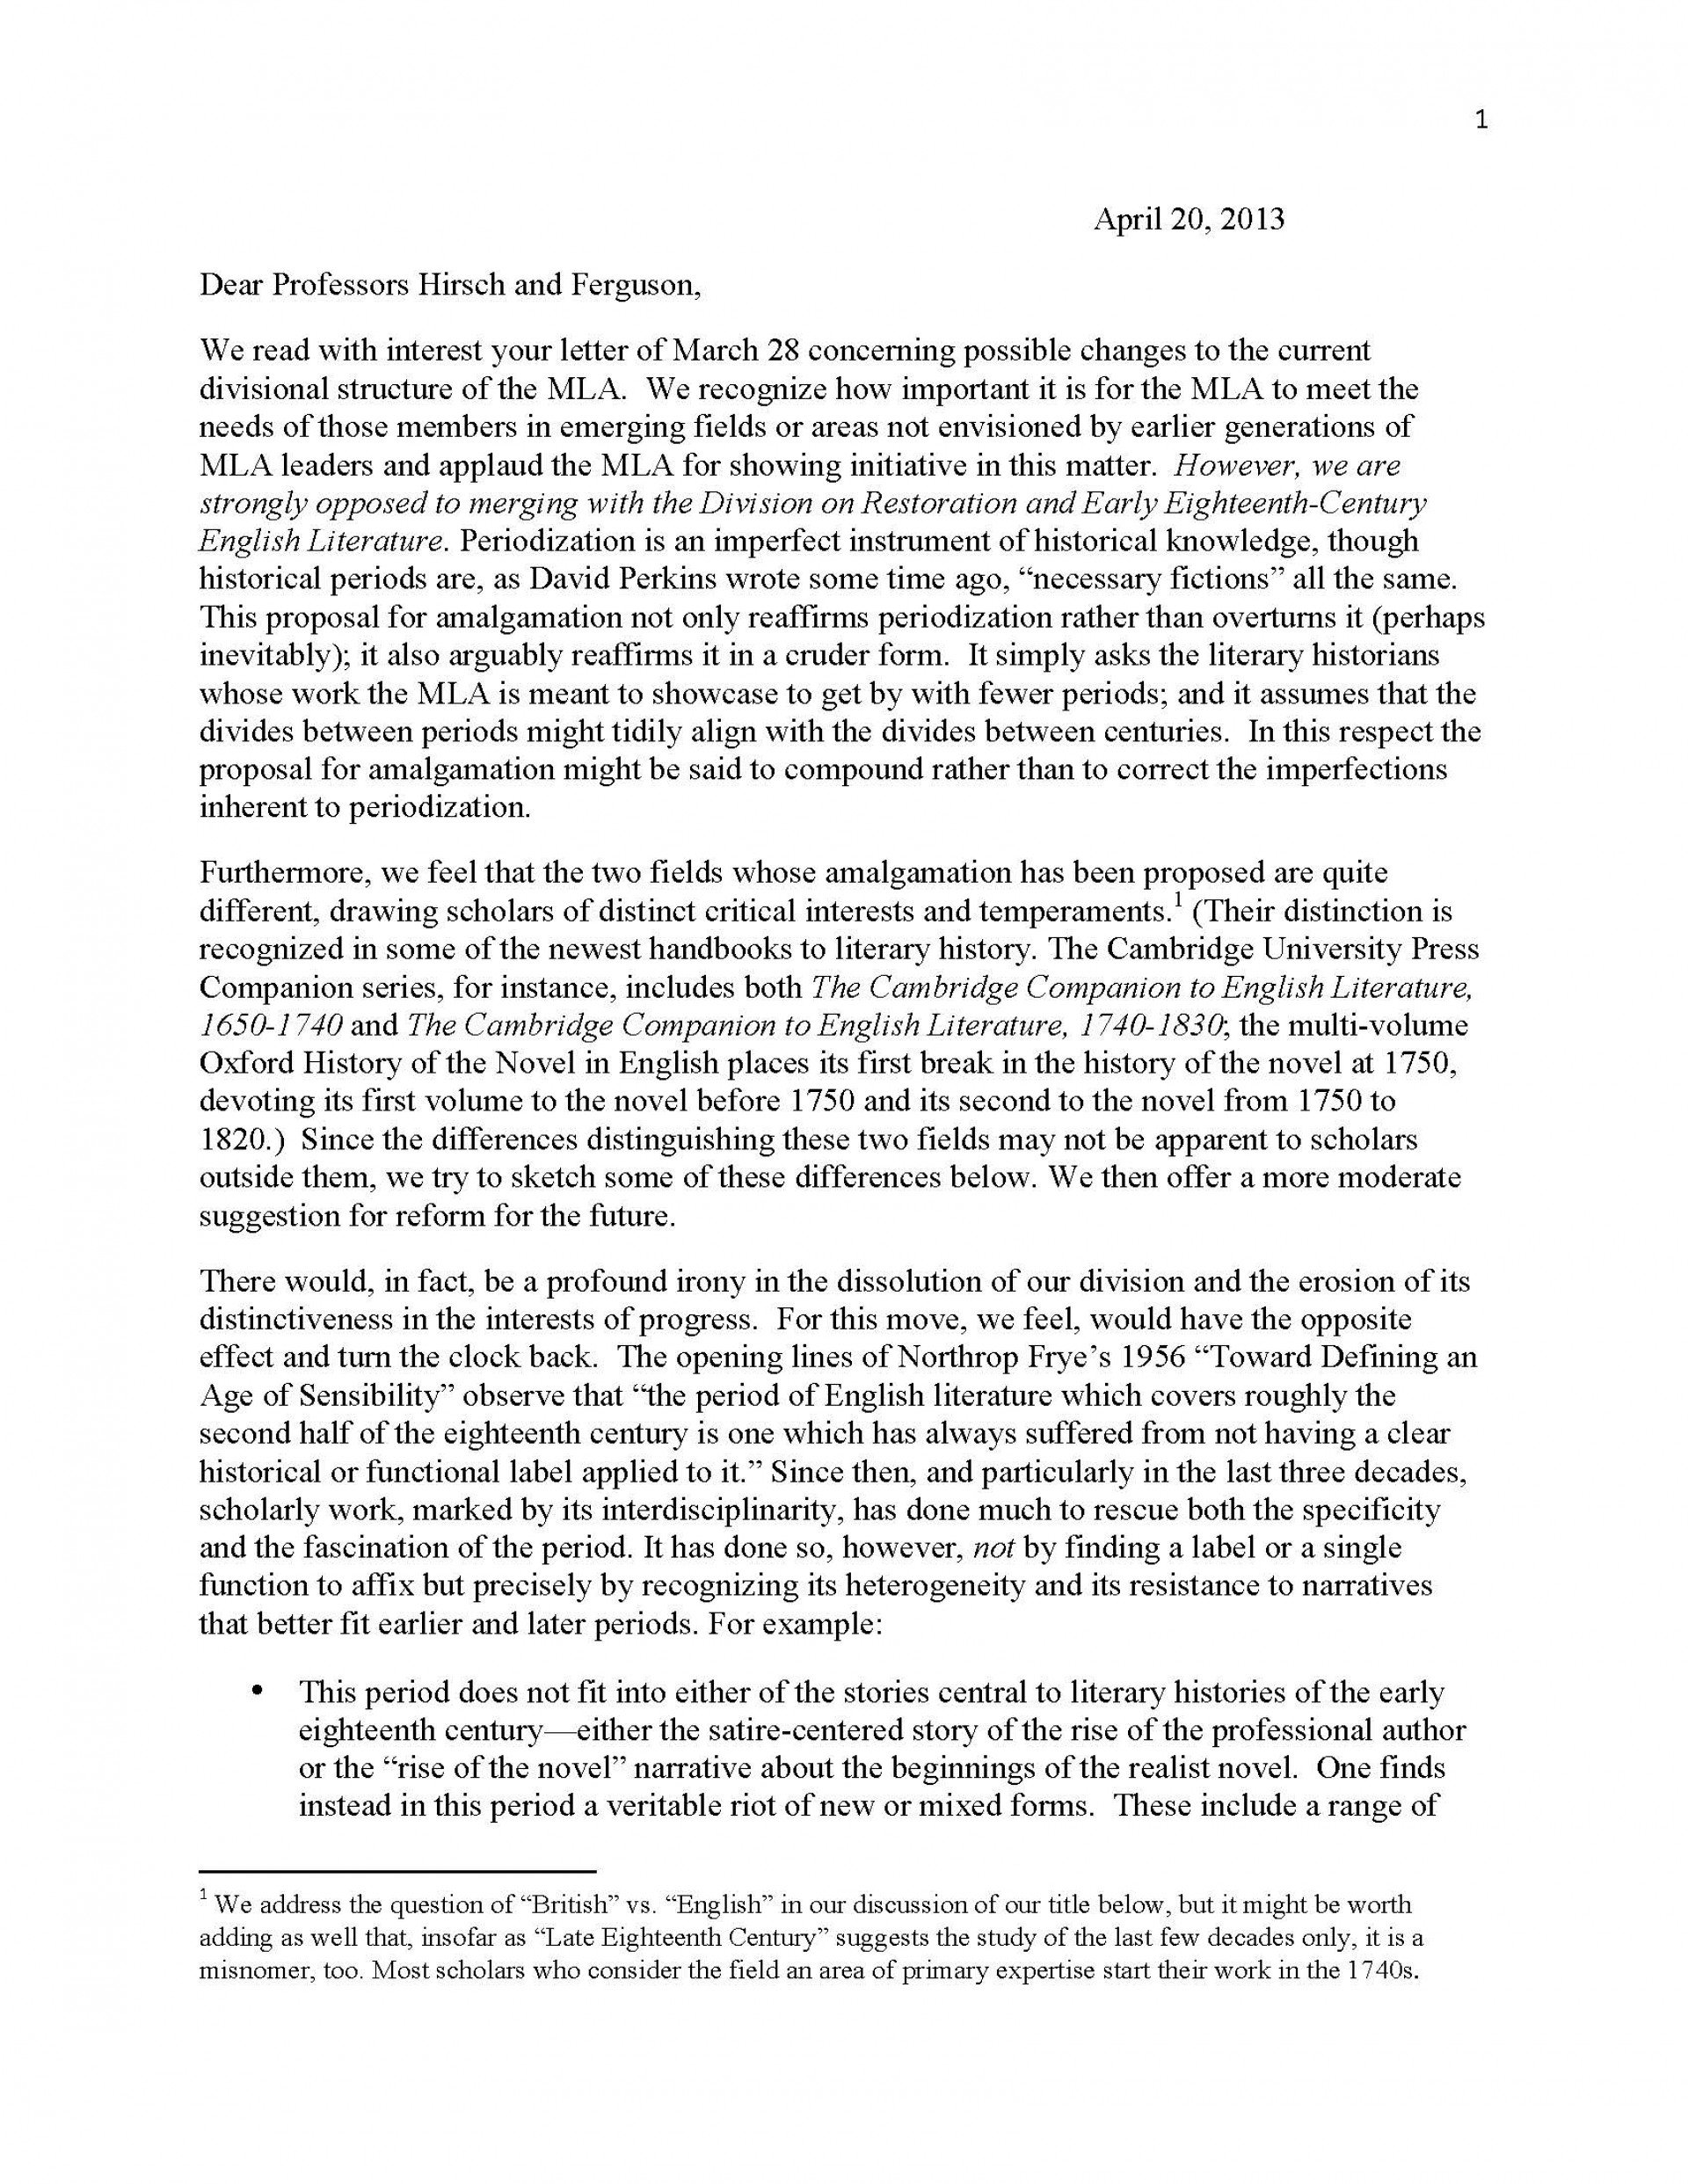 008 Essay Proposal Response To Marianne Hirsch Margaret Ferguson Rev Final Copy Page 1 Top Samples Mla Format Satirical Ideas 1920